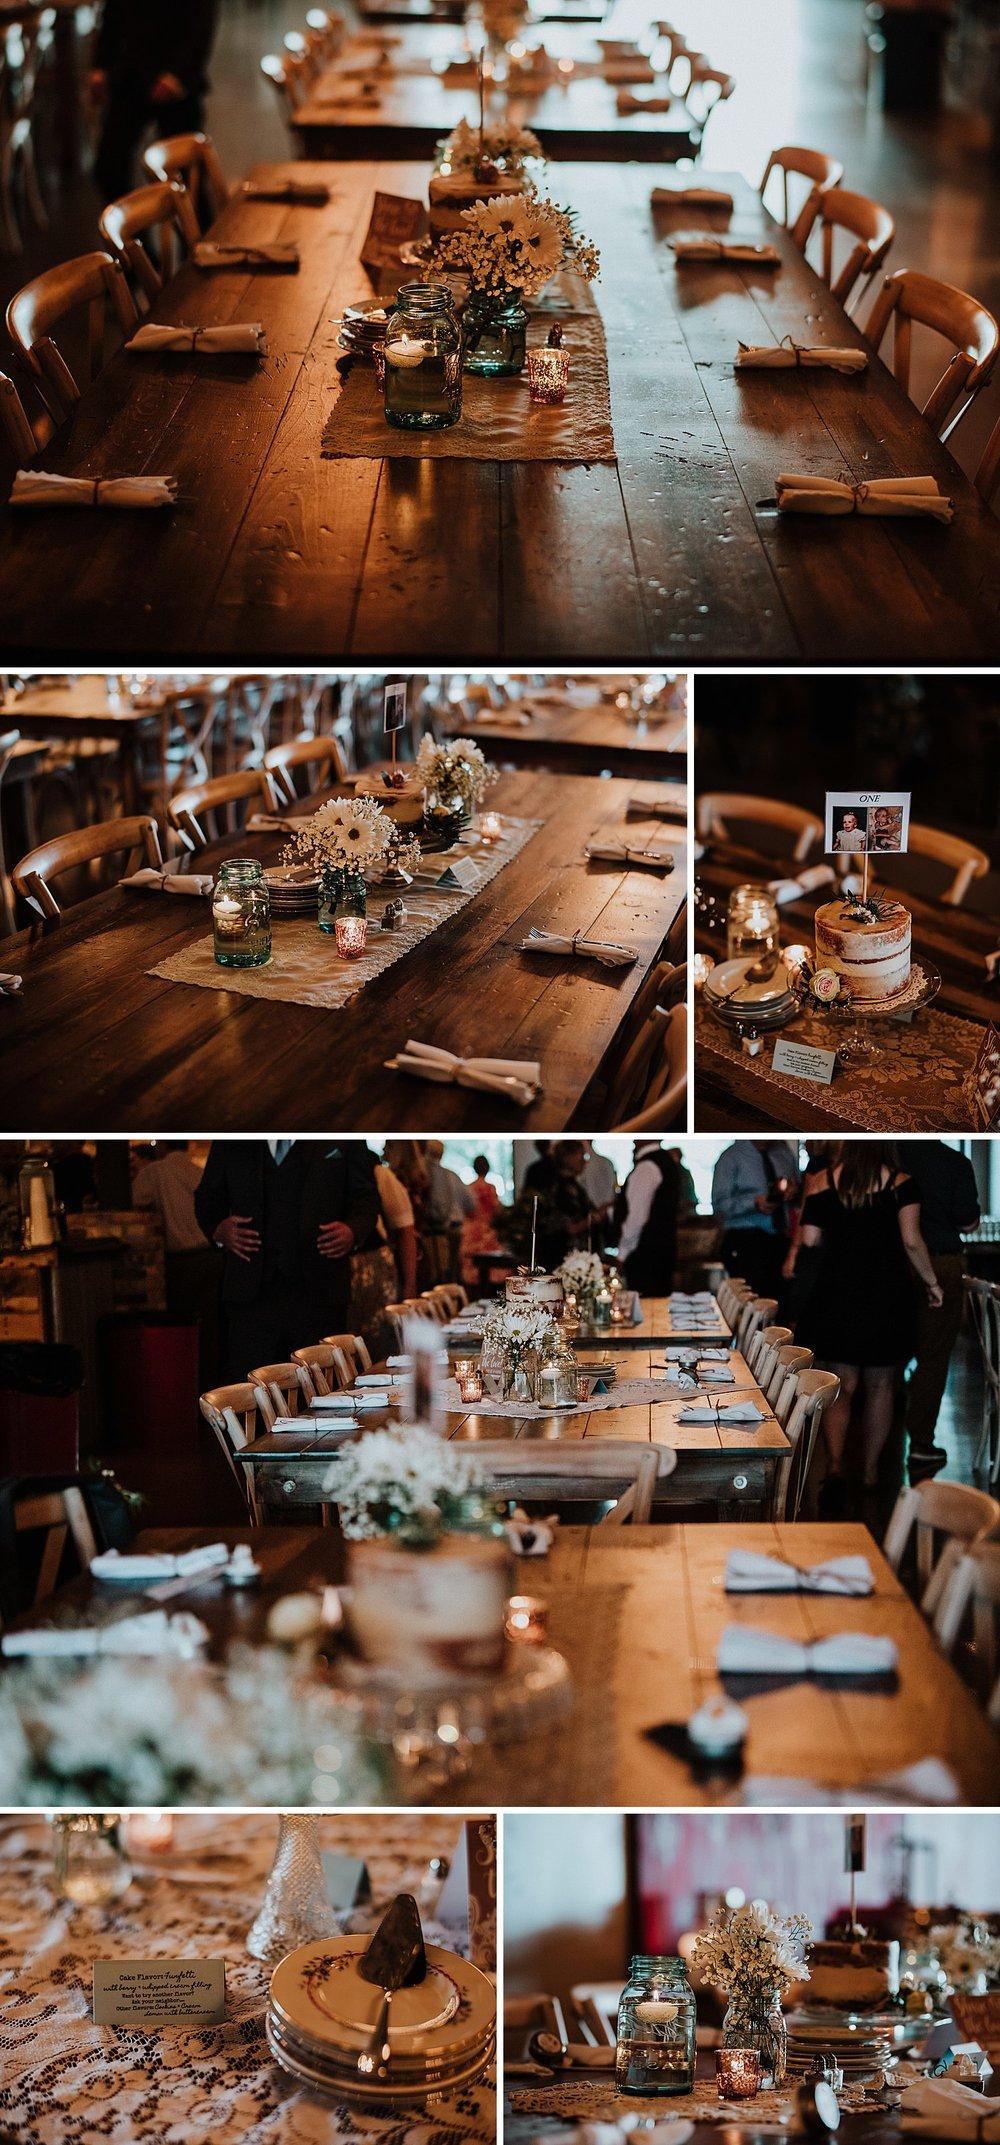 Terrace-167-Documentary-Wedding-Photographer_0020.jpg